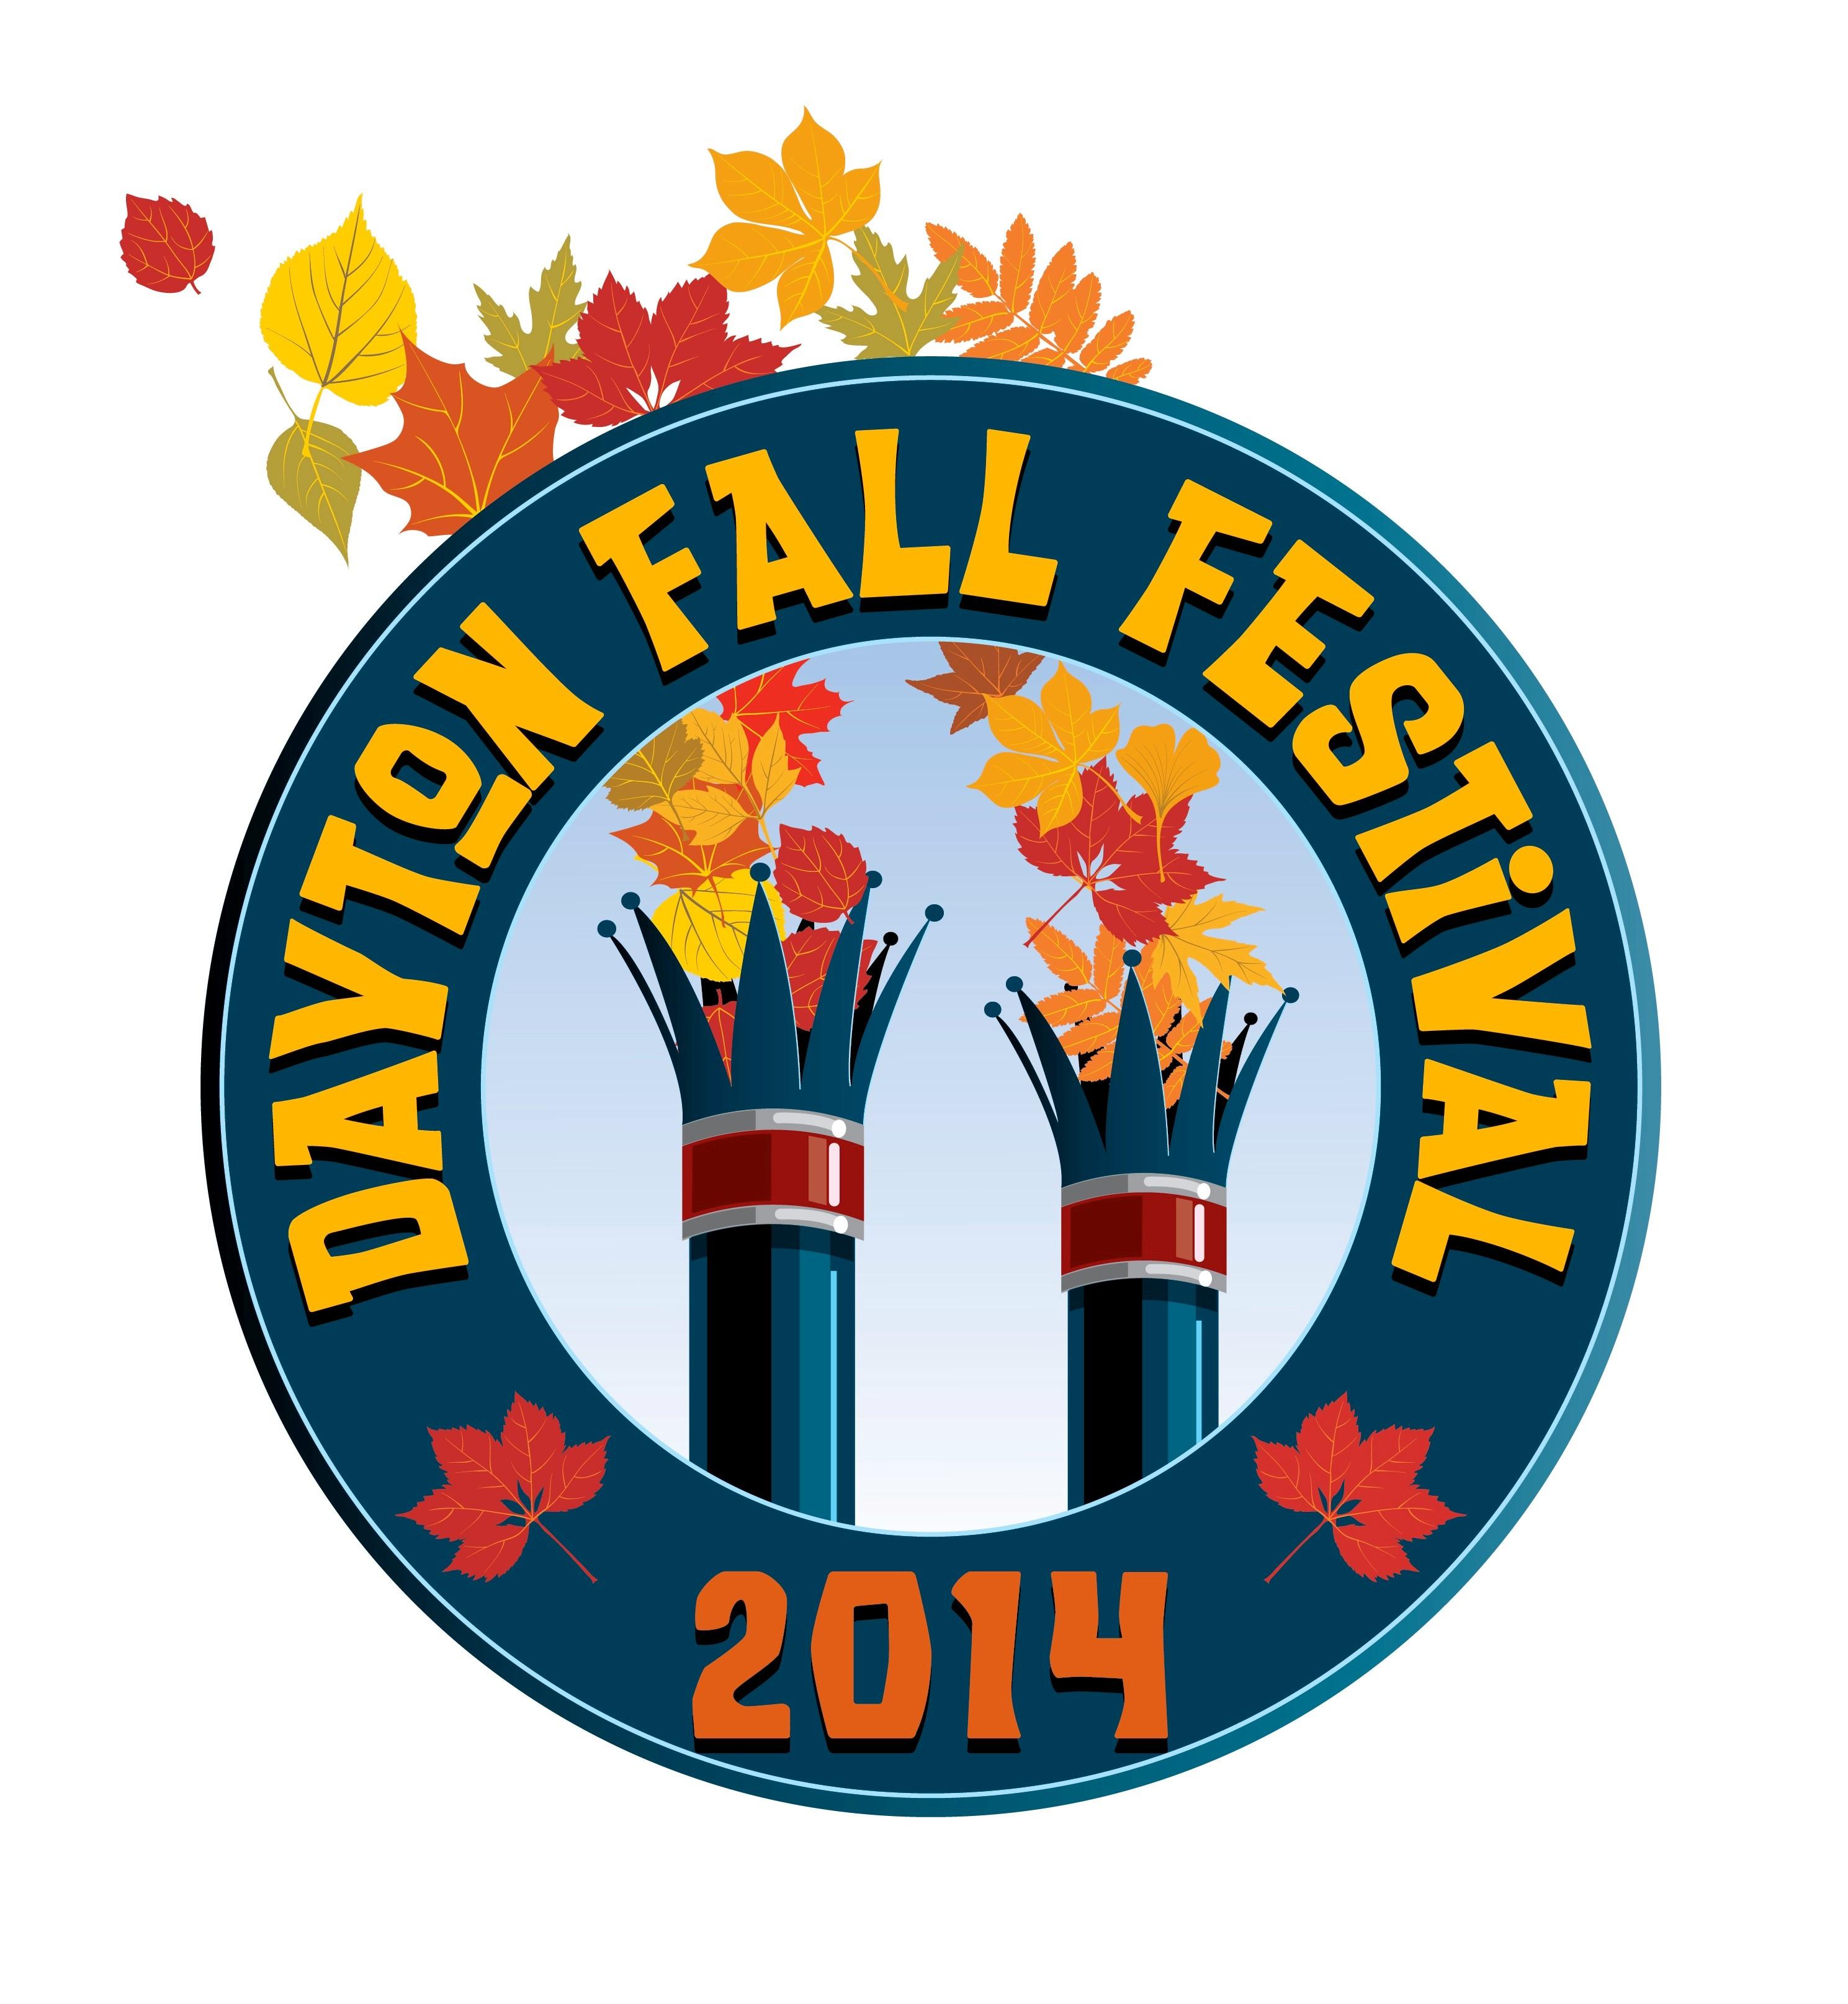 Fall Festival 2014